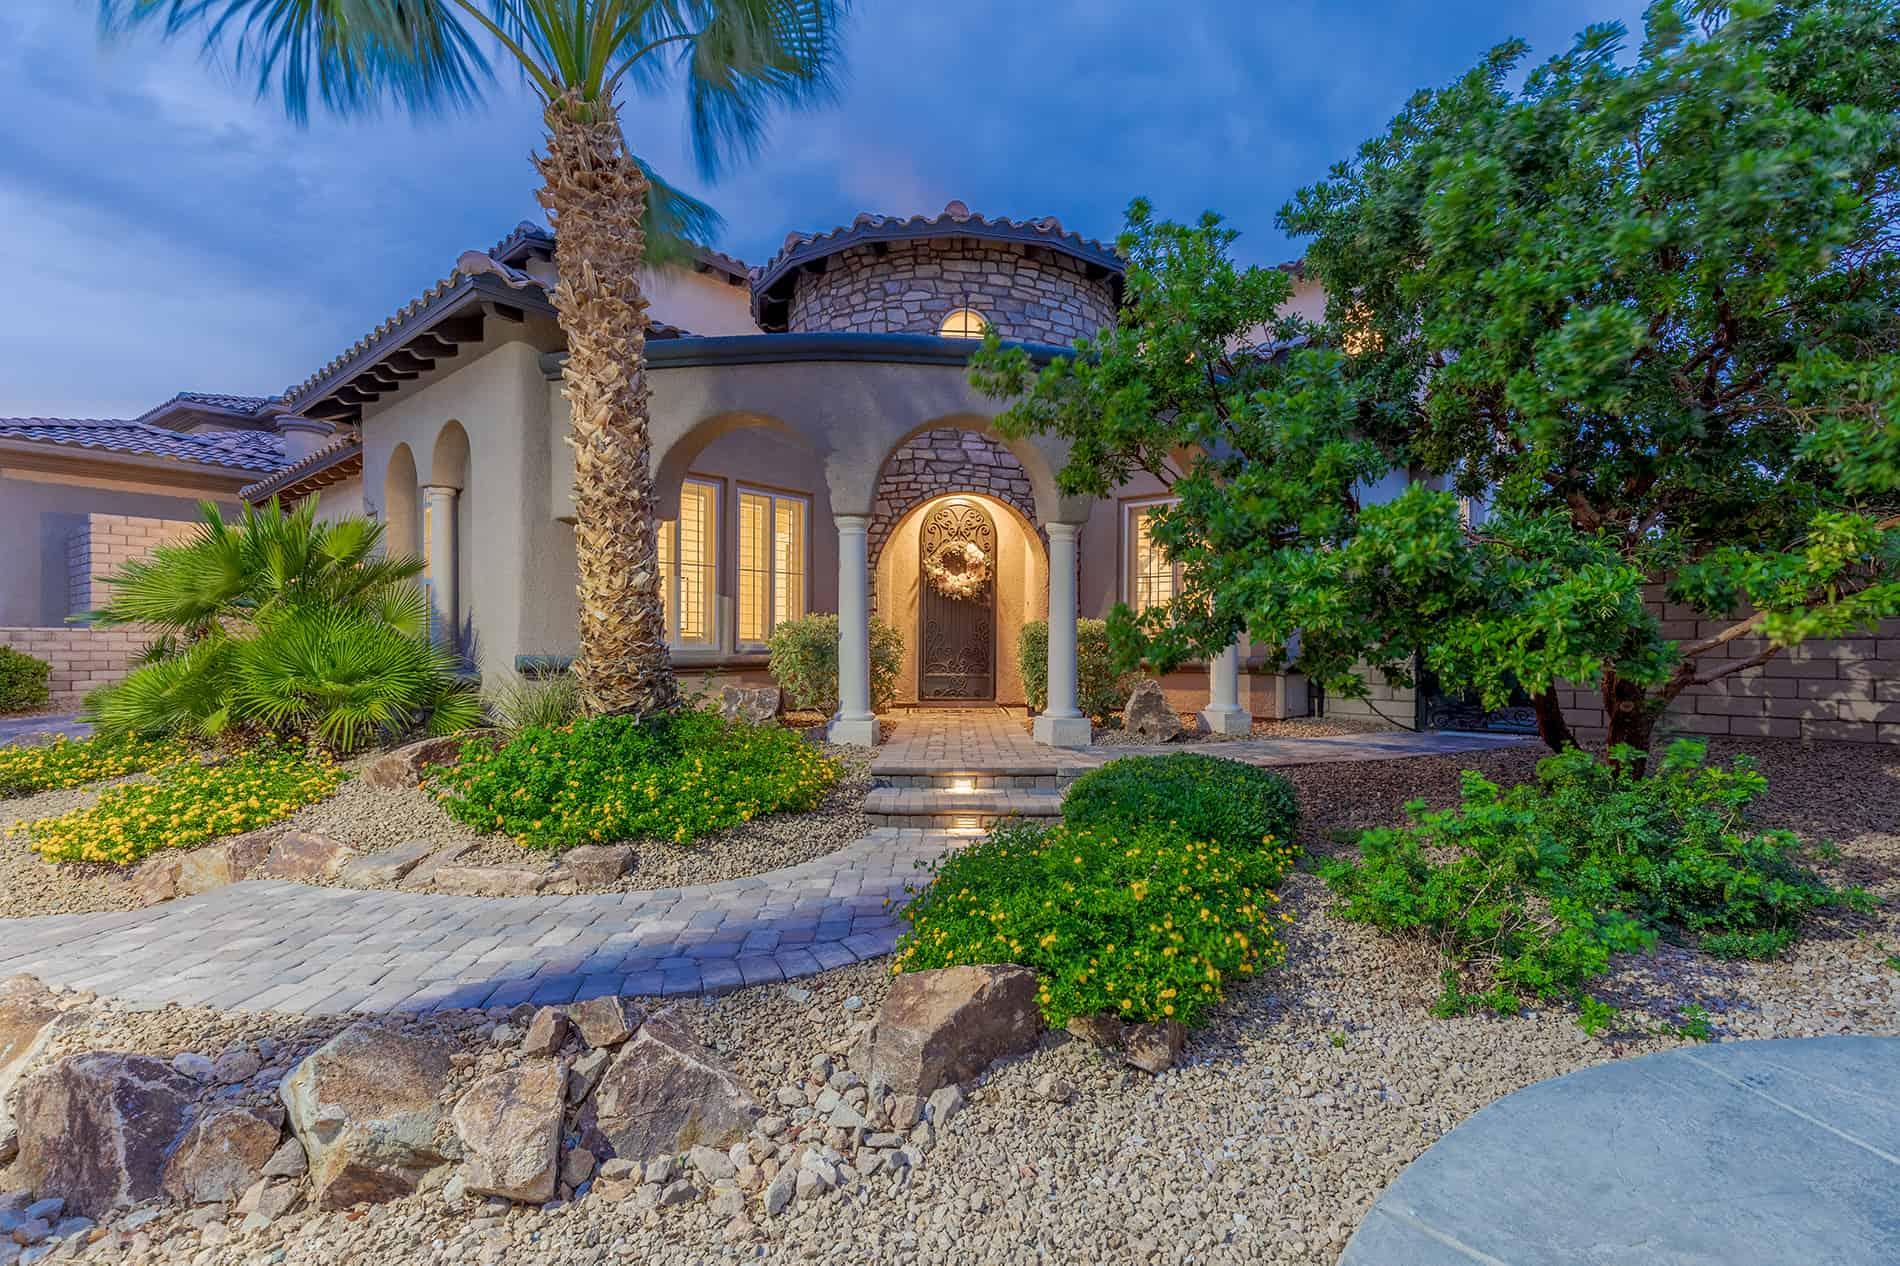 las-vegas-luxry-real-estate-realtor-rob-jensen-company-12108-vista-linda-avenue-the-paseos080